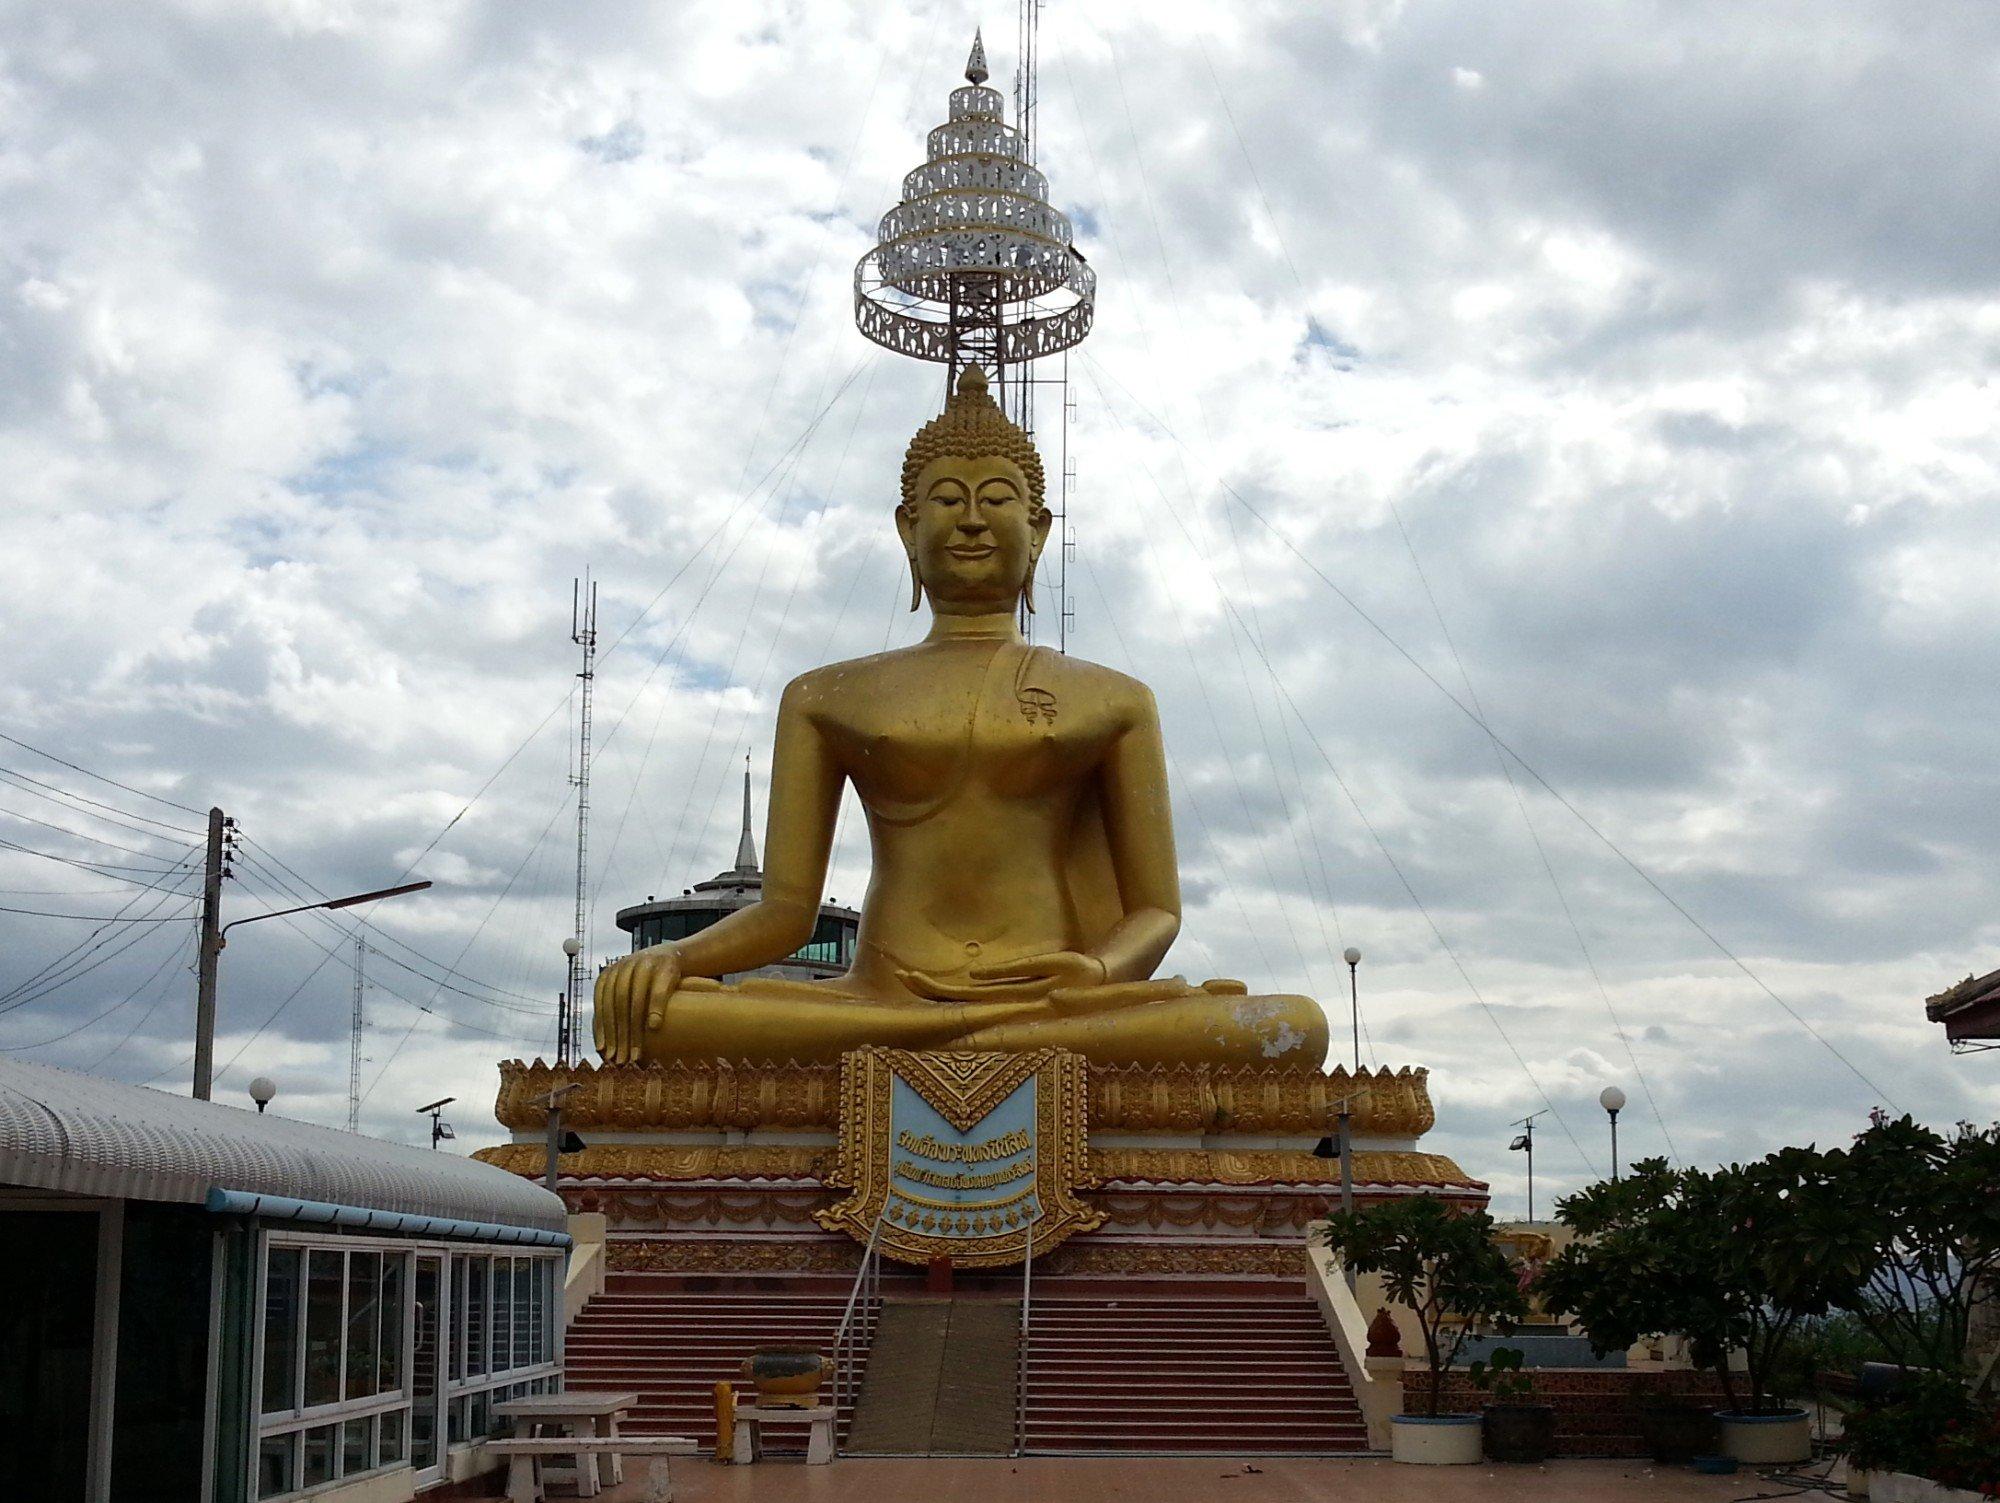 Hill top Buddha statue at Wat Khiriwong